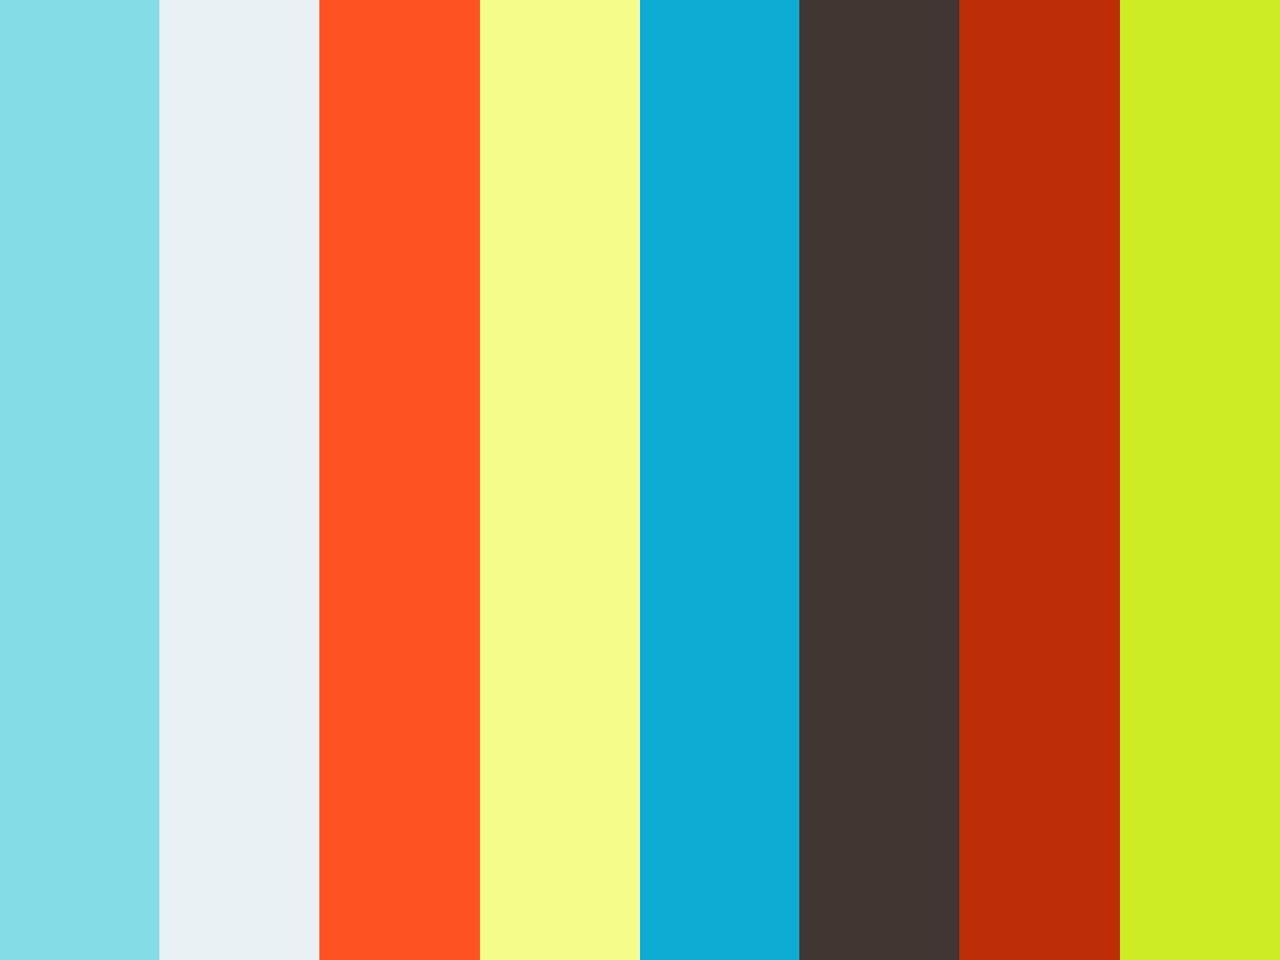 TrackMagic_01_Aktivierungs-Schluessel andere Anbieter (neu2)